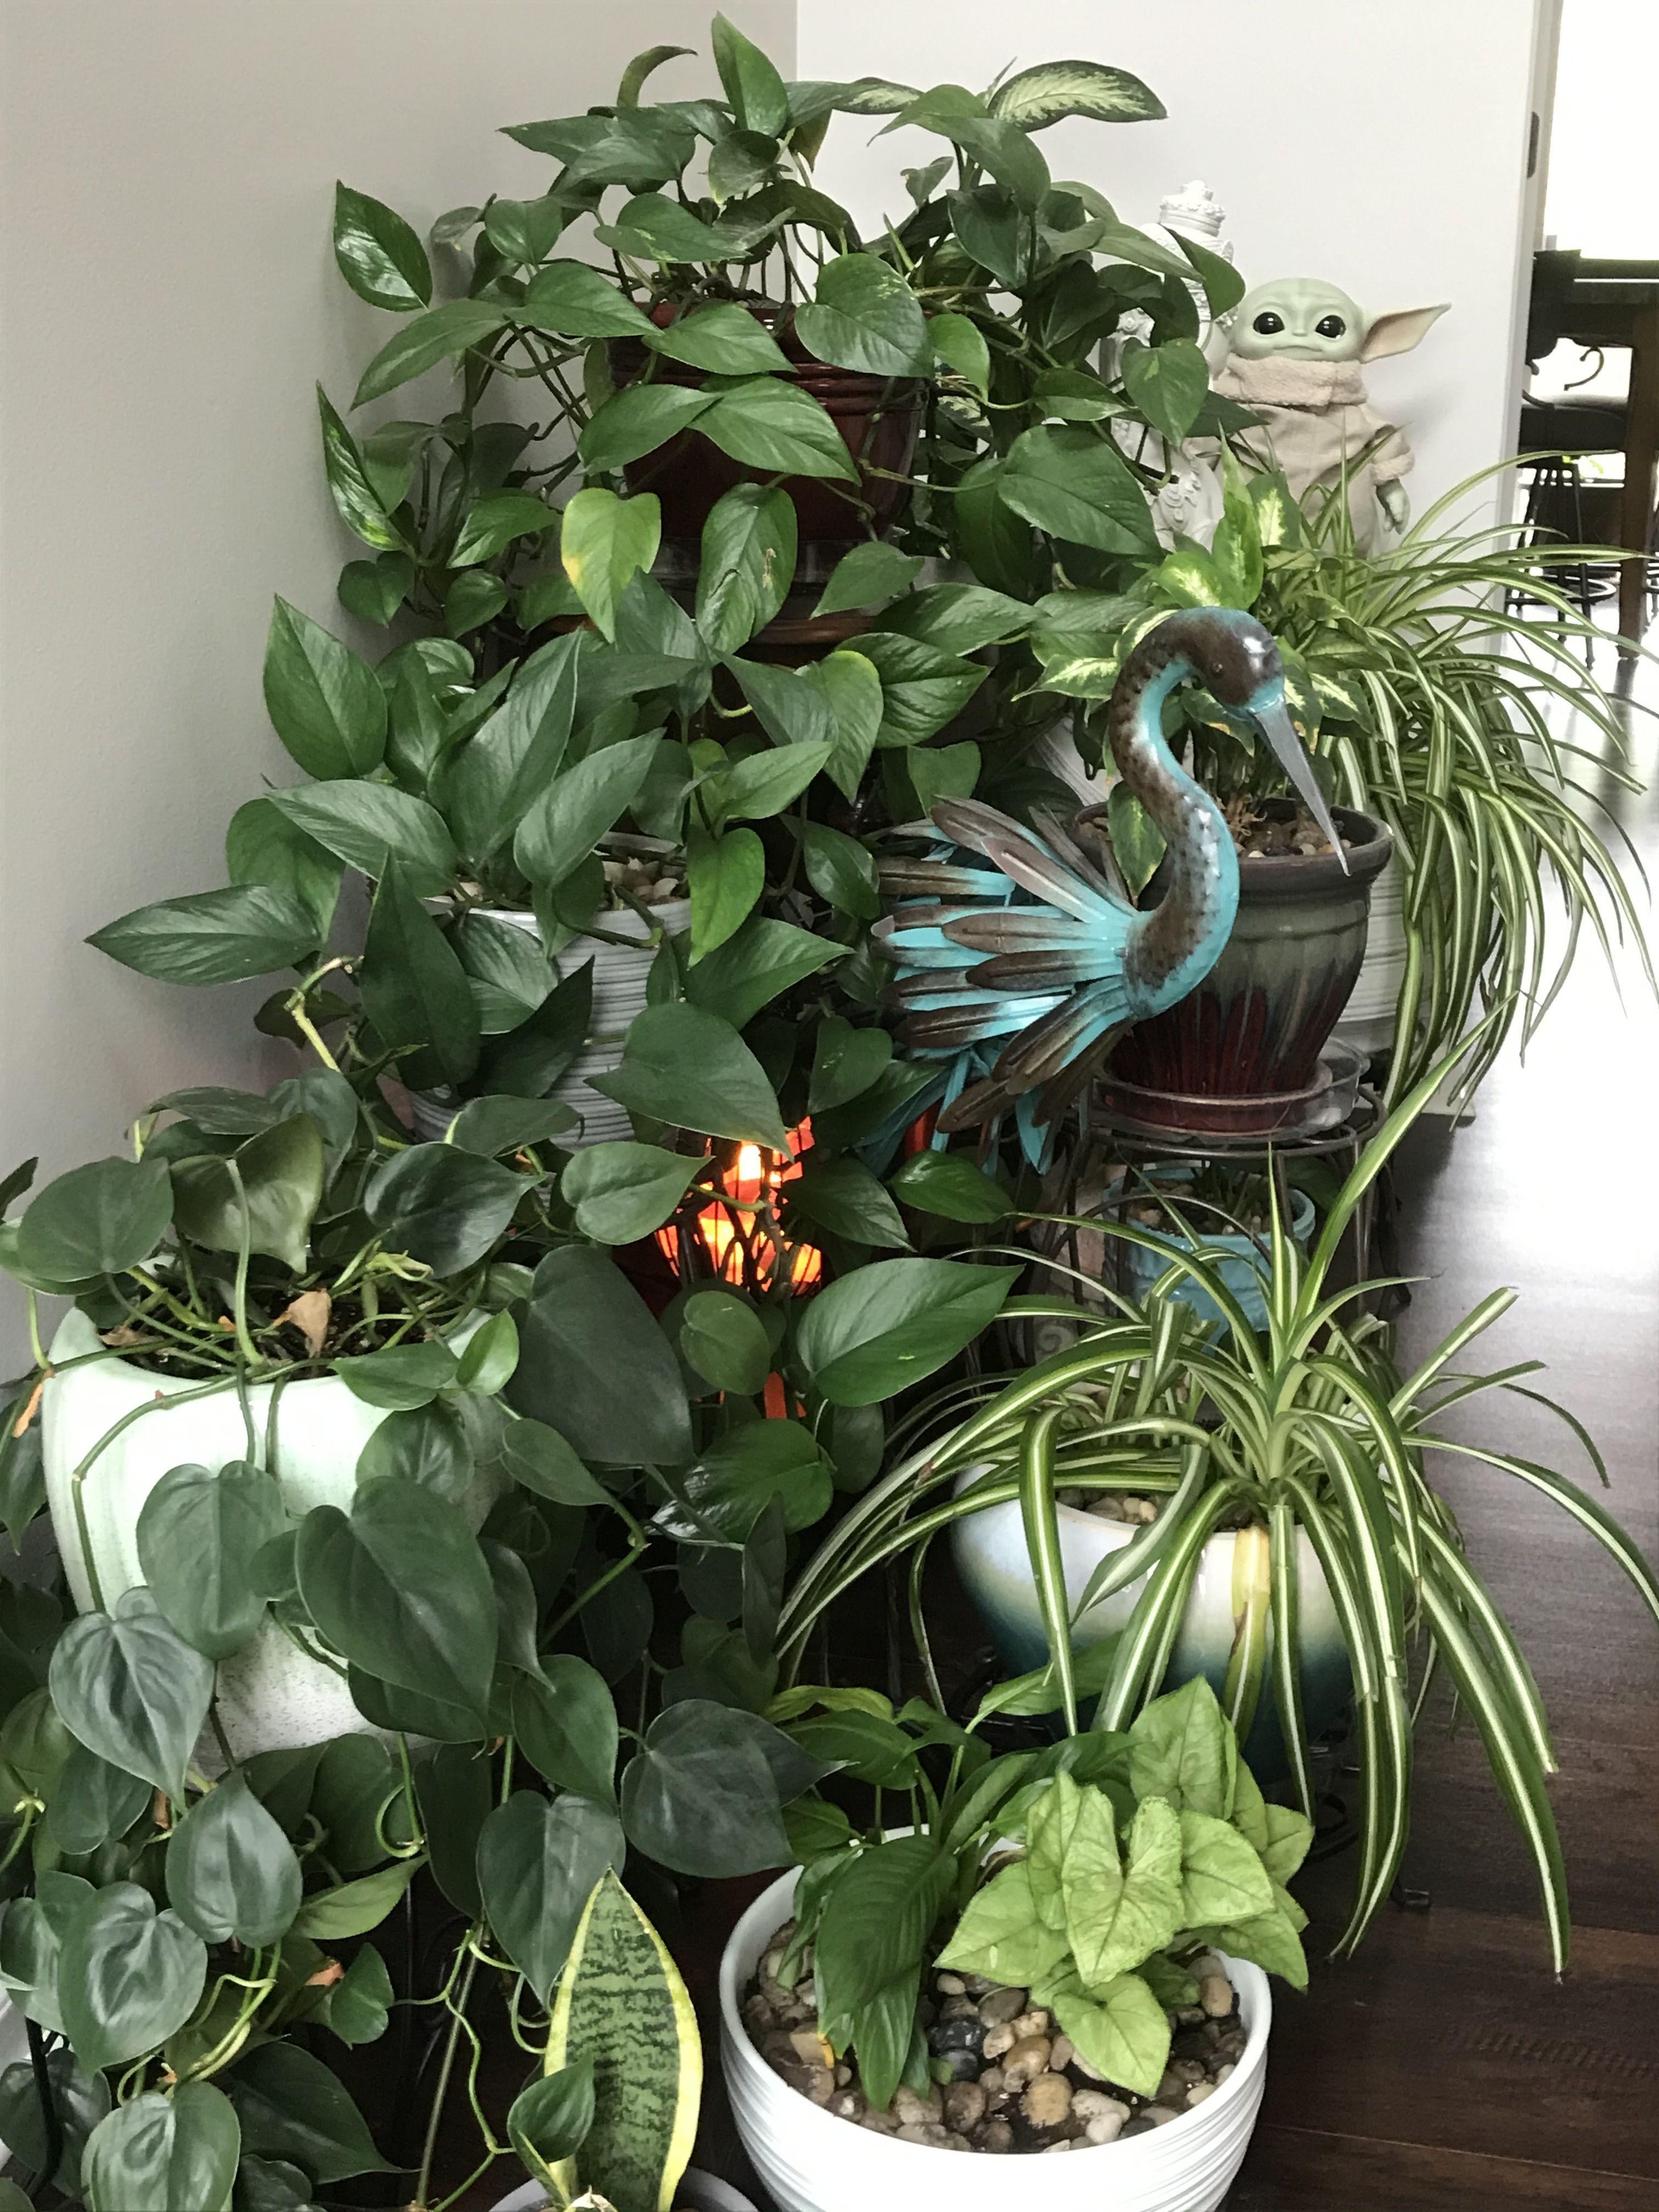 Baby Yoda Hiding In The Plants Plants Yoda Baby